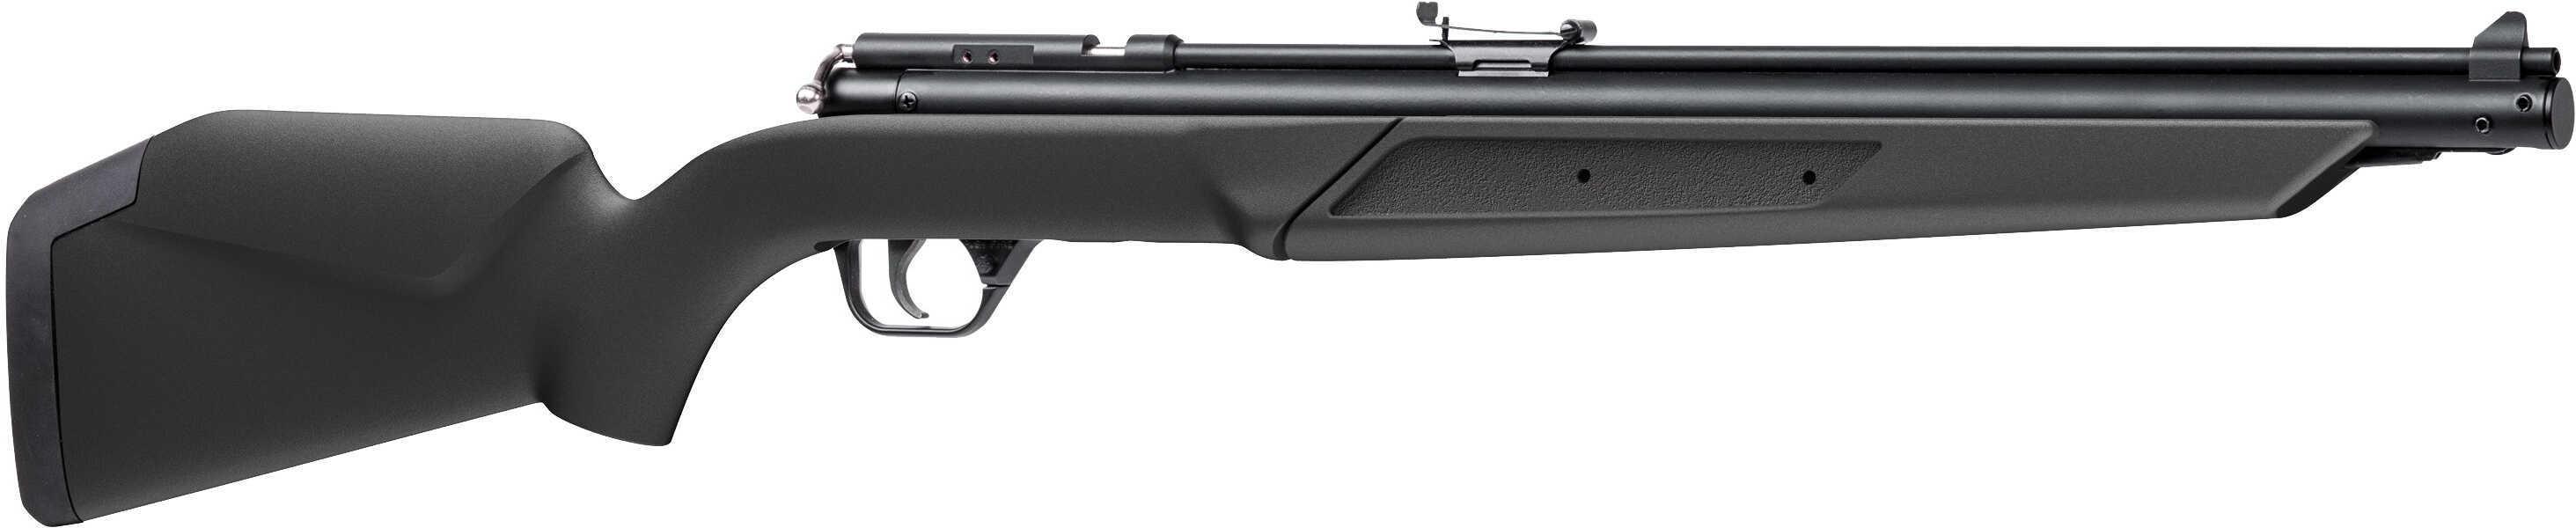 Ben 392S Bolt Action 22Cal Air Rifle